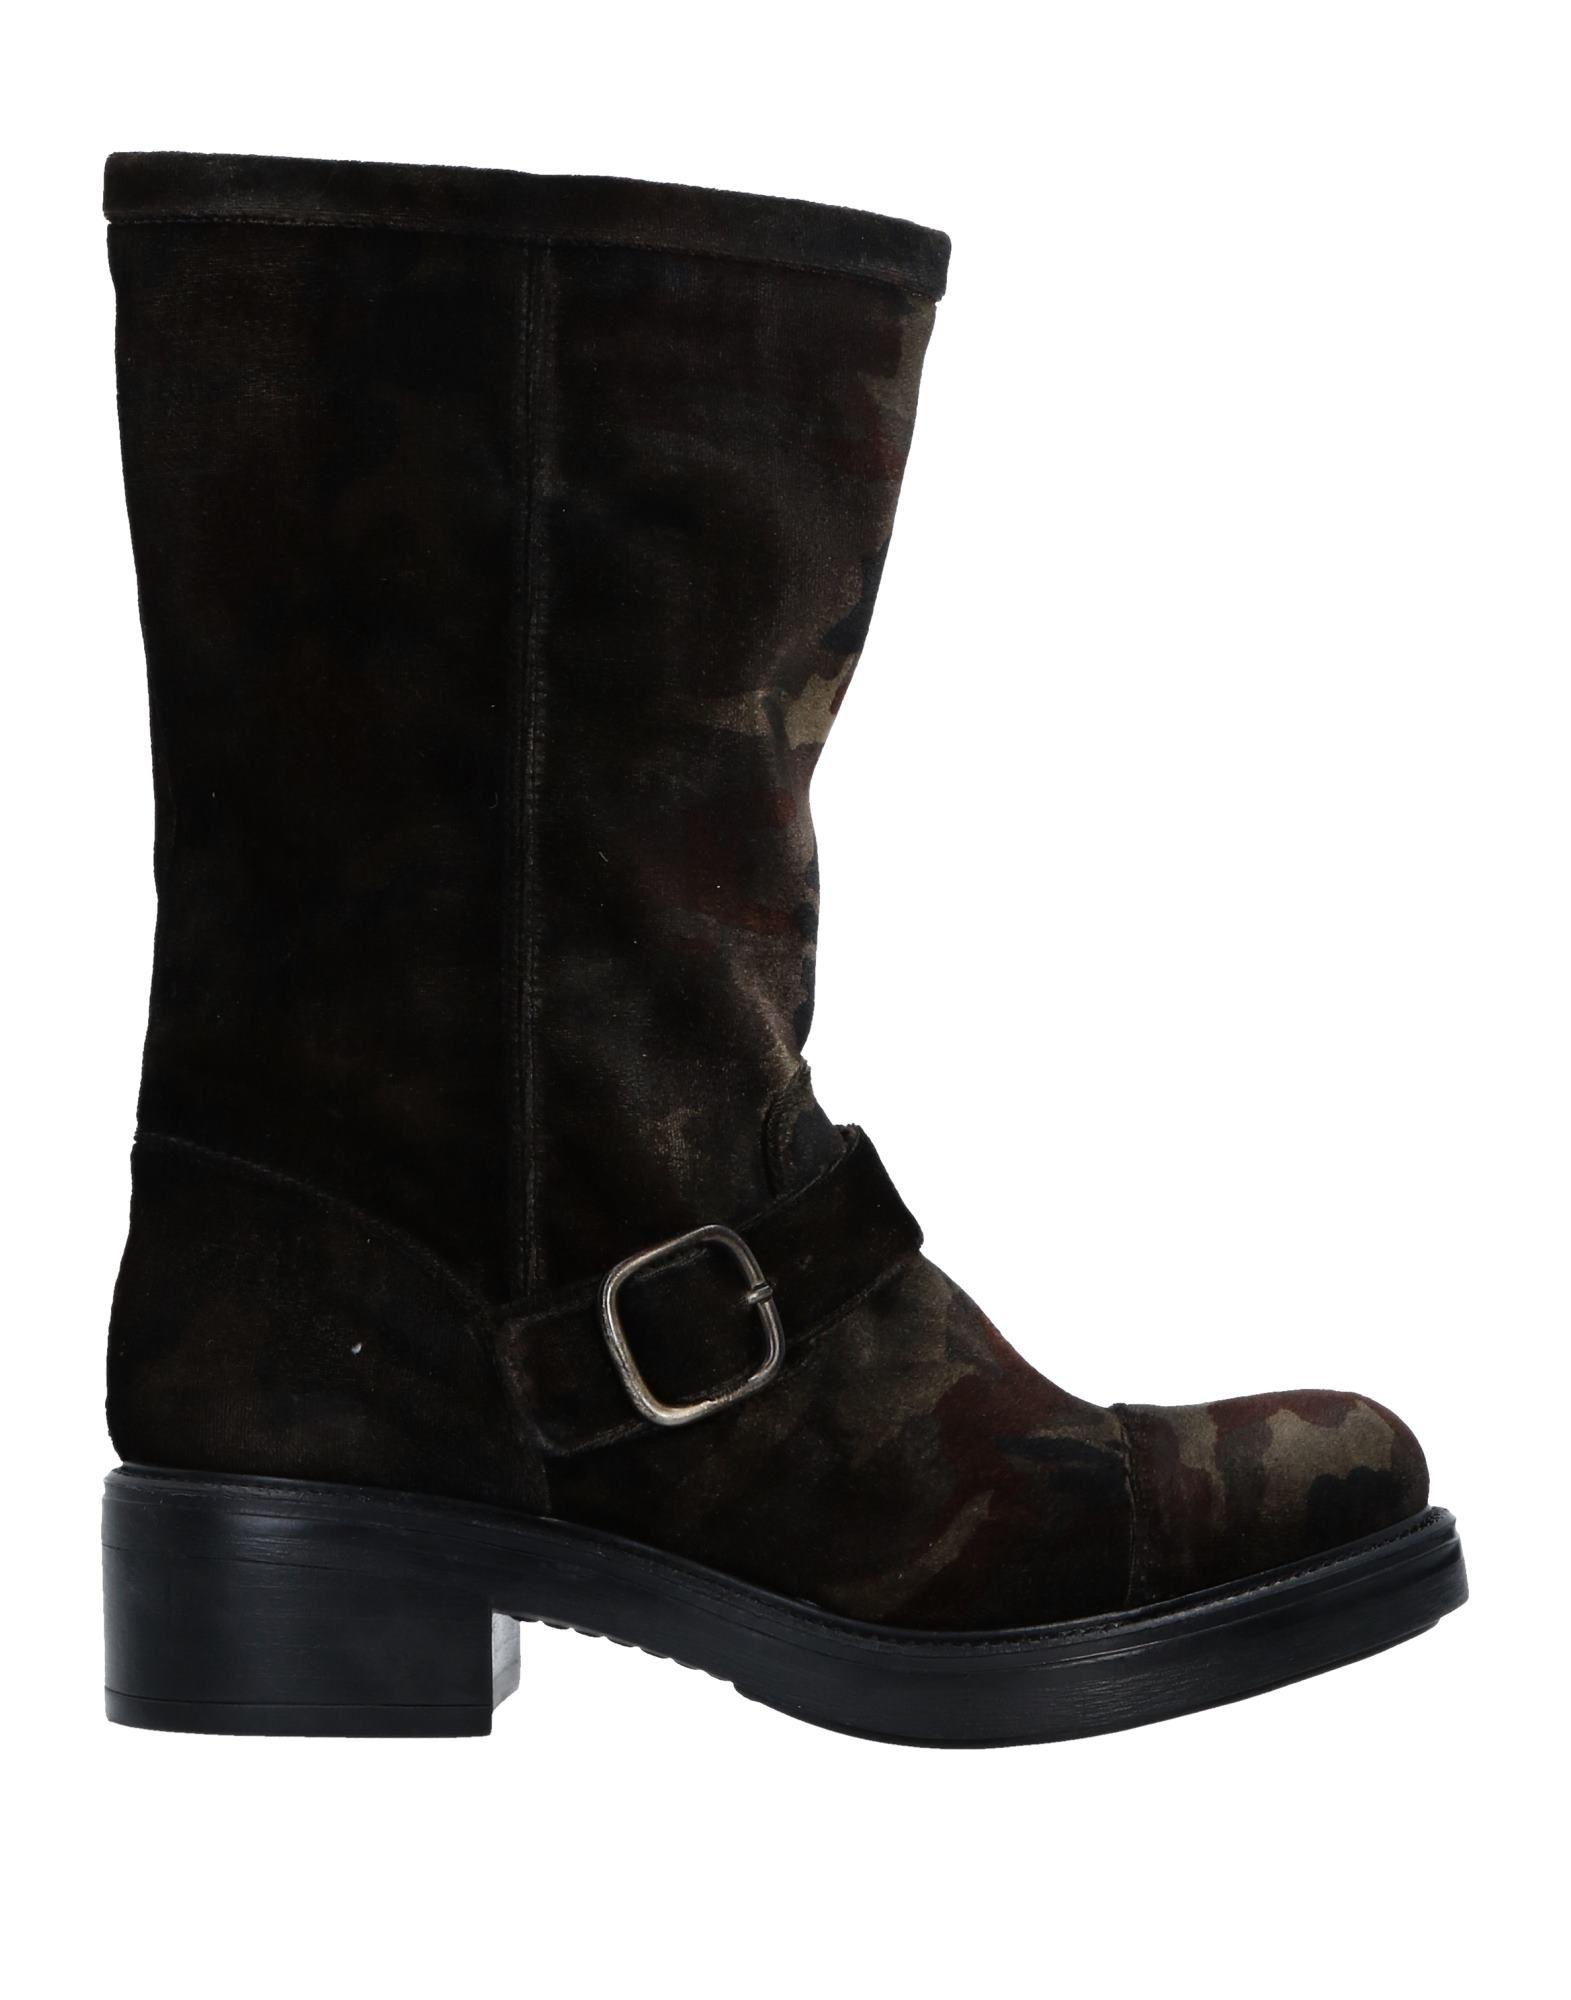 Stilvolle billige Stiefelette Schuhe Elena Iachi Stiefelette billige Damen  11513044FP 240bad